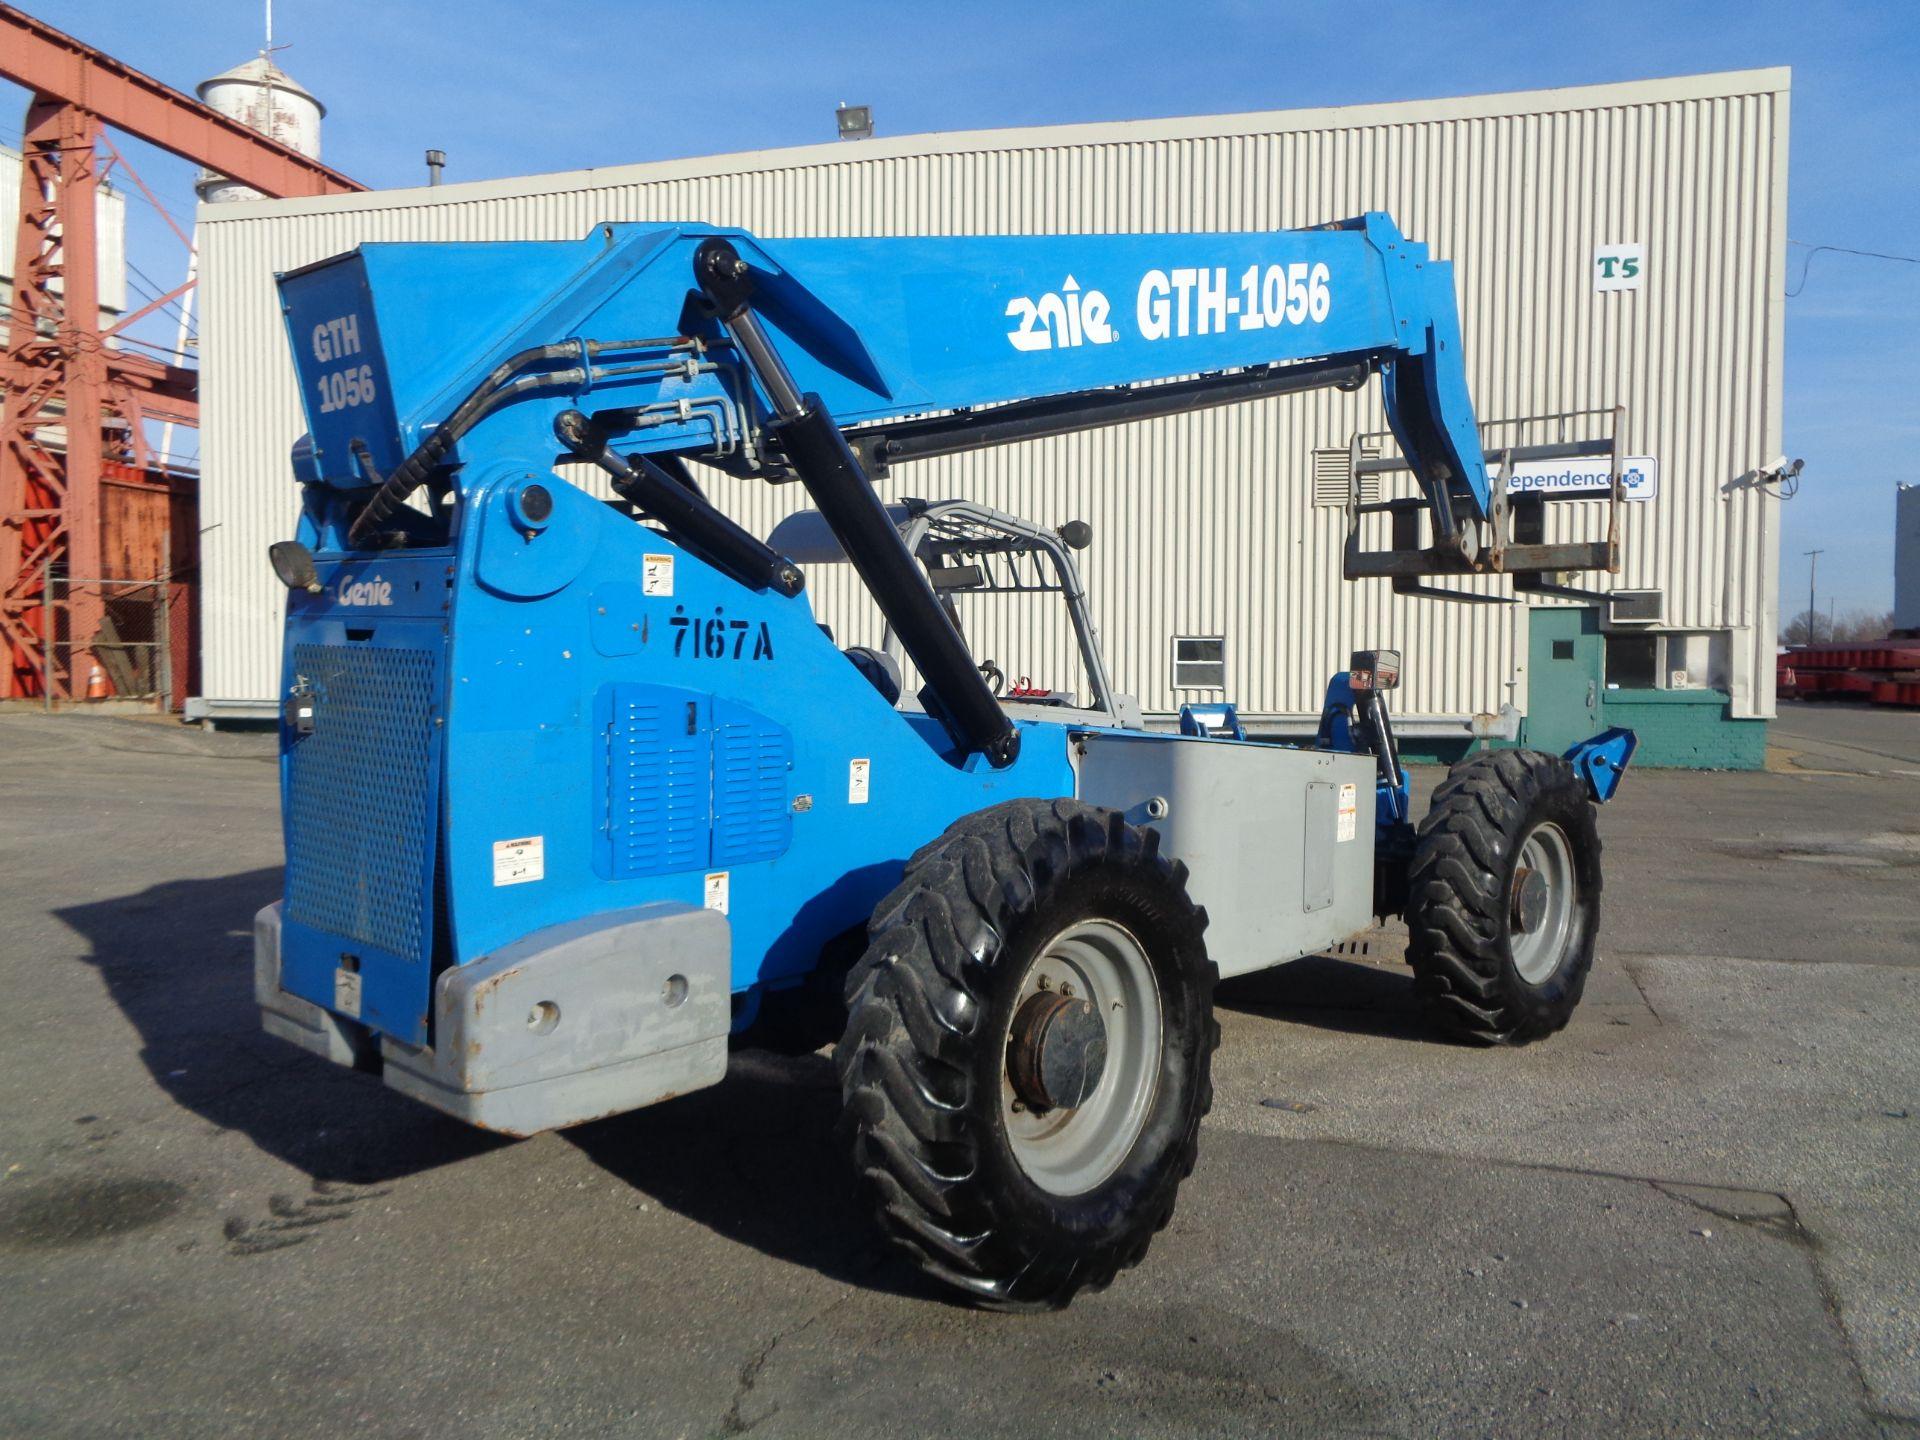 Lot 51 - 2013 Genie GTH1056 10,000lb Telescopic Forklift